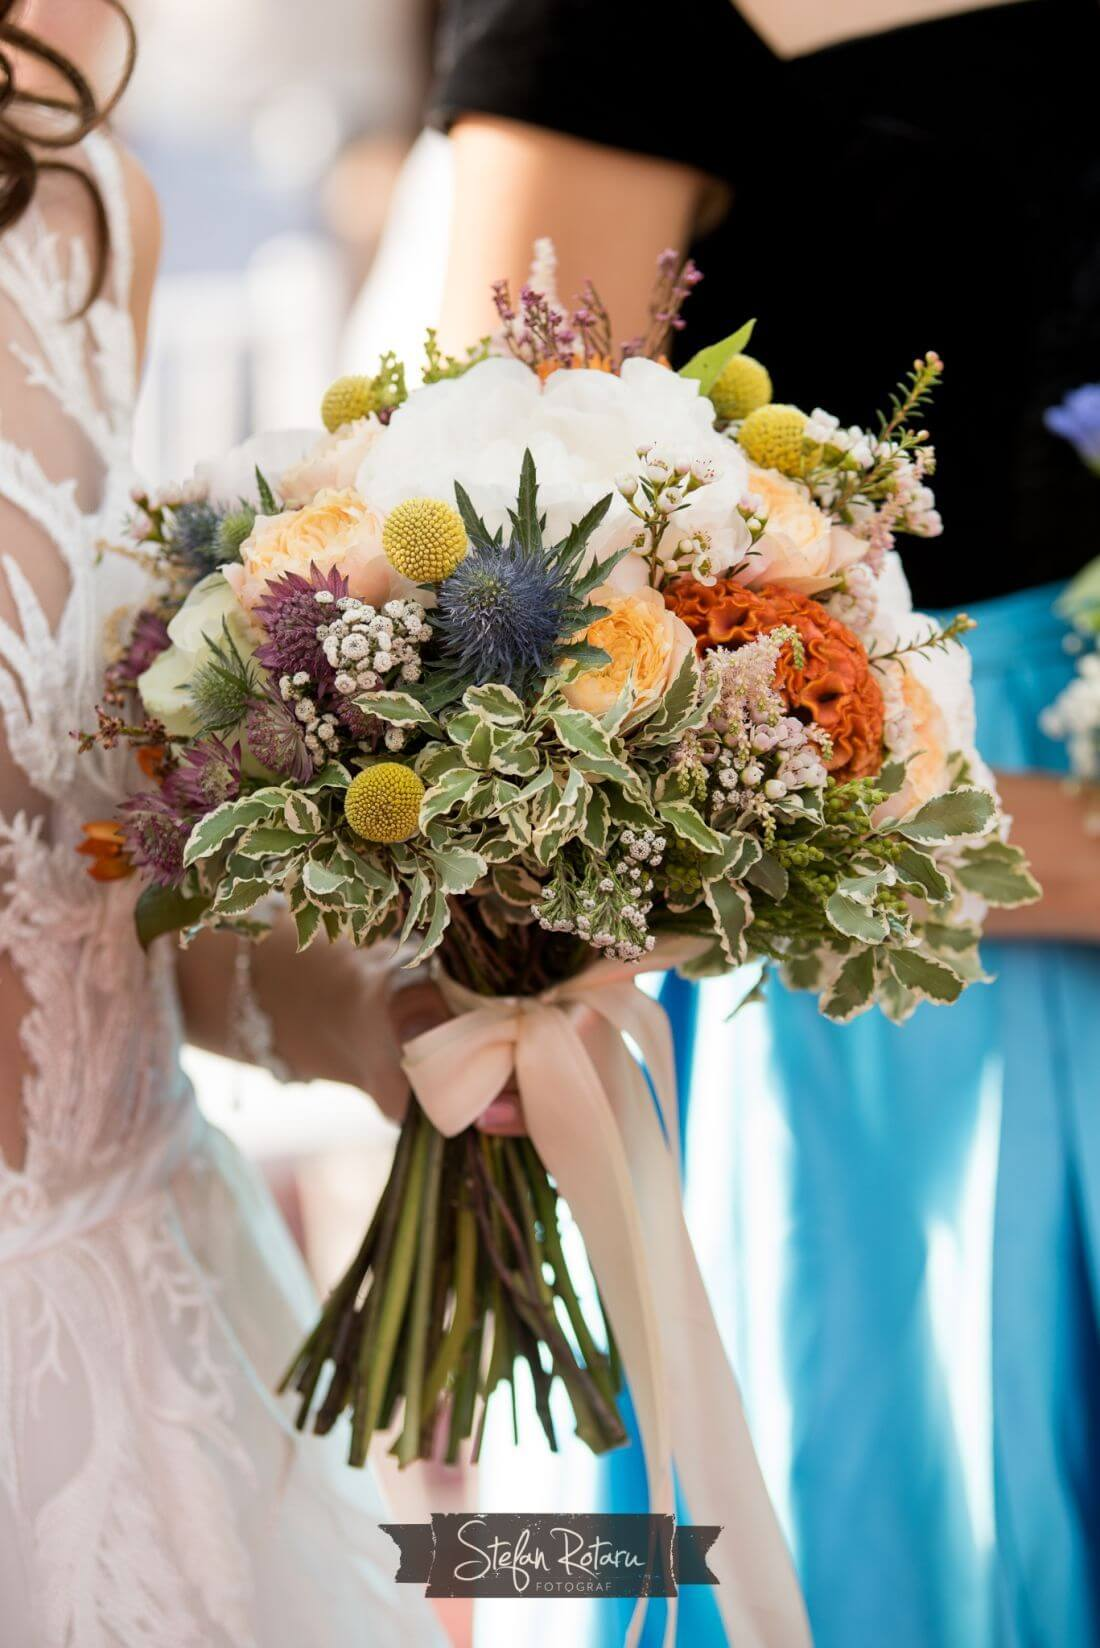 Petrecere ca-n Vama Veche - Alina si Cristi-IDO-Weddings-nuntiinaerliber (15)